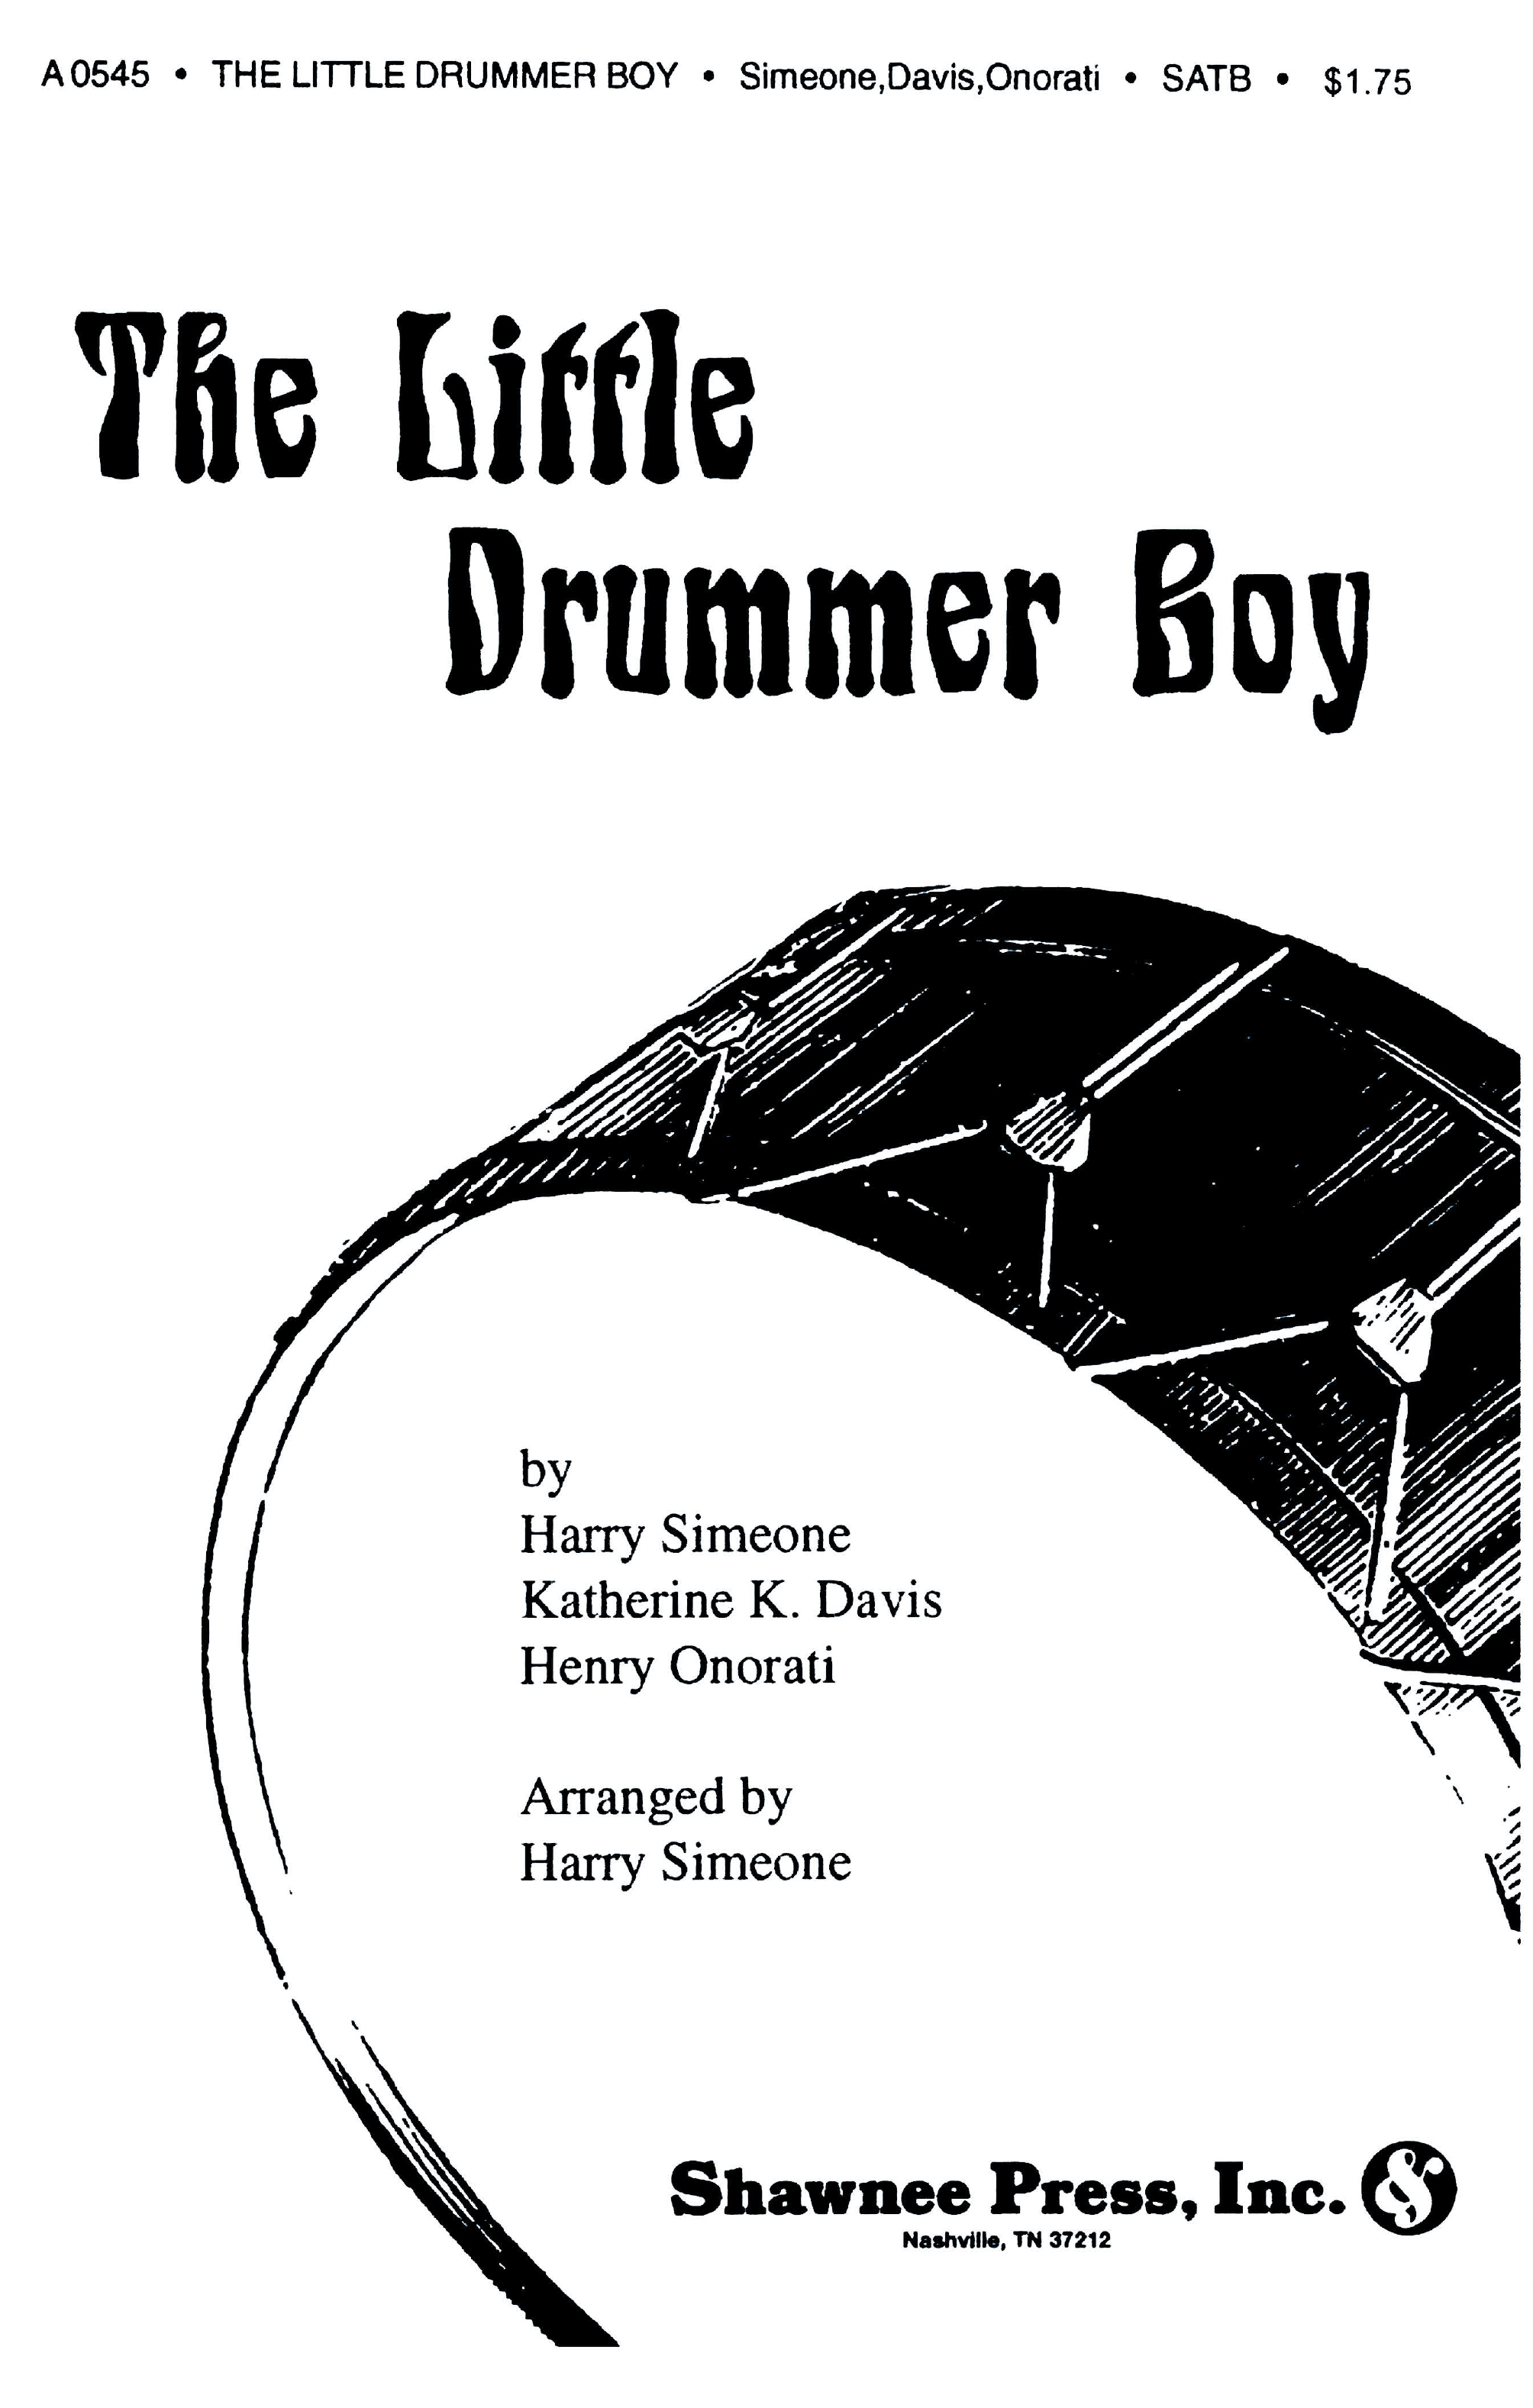 Harry Simeone Henry Onorati Katherine K. Davis: The Little Drummer Boy: SATB: